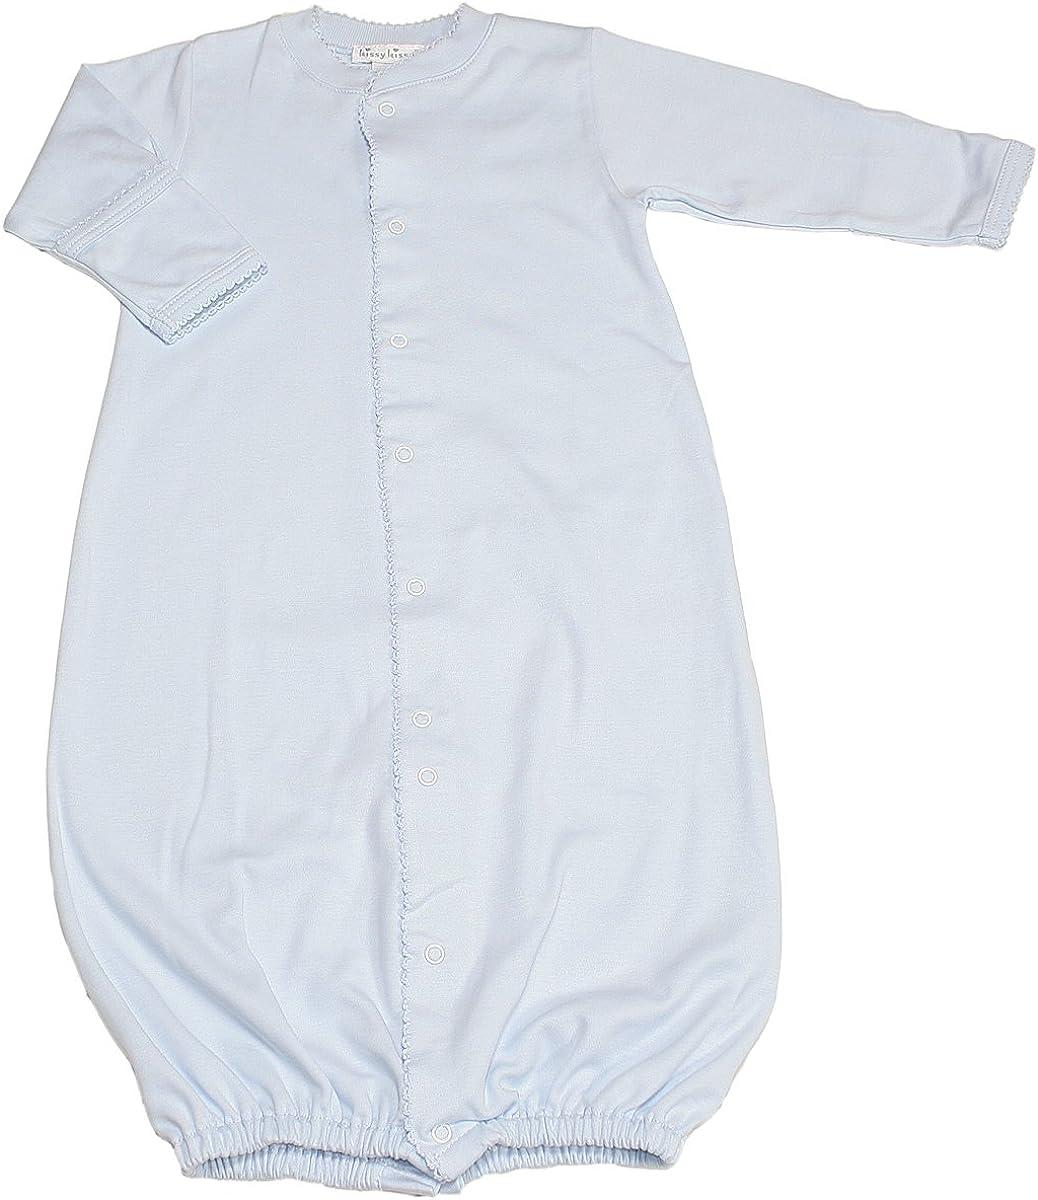 Blue Kissy Kissy Basic Converter Gown